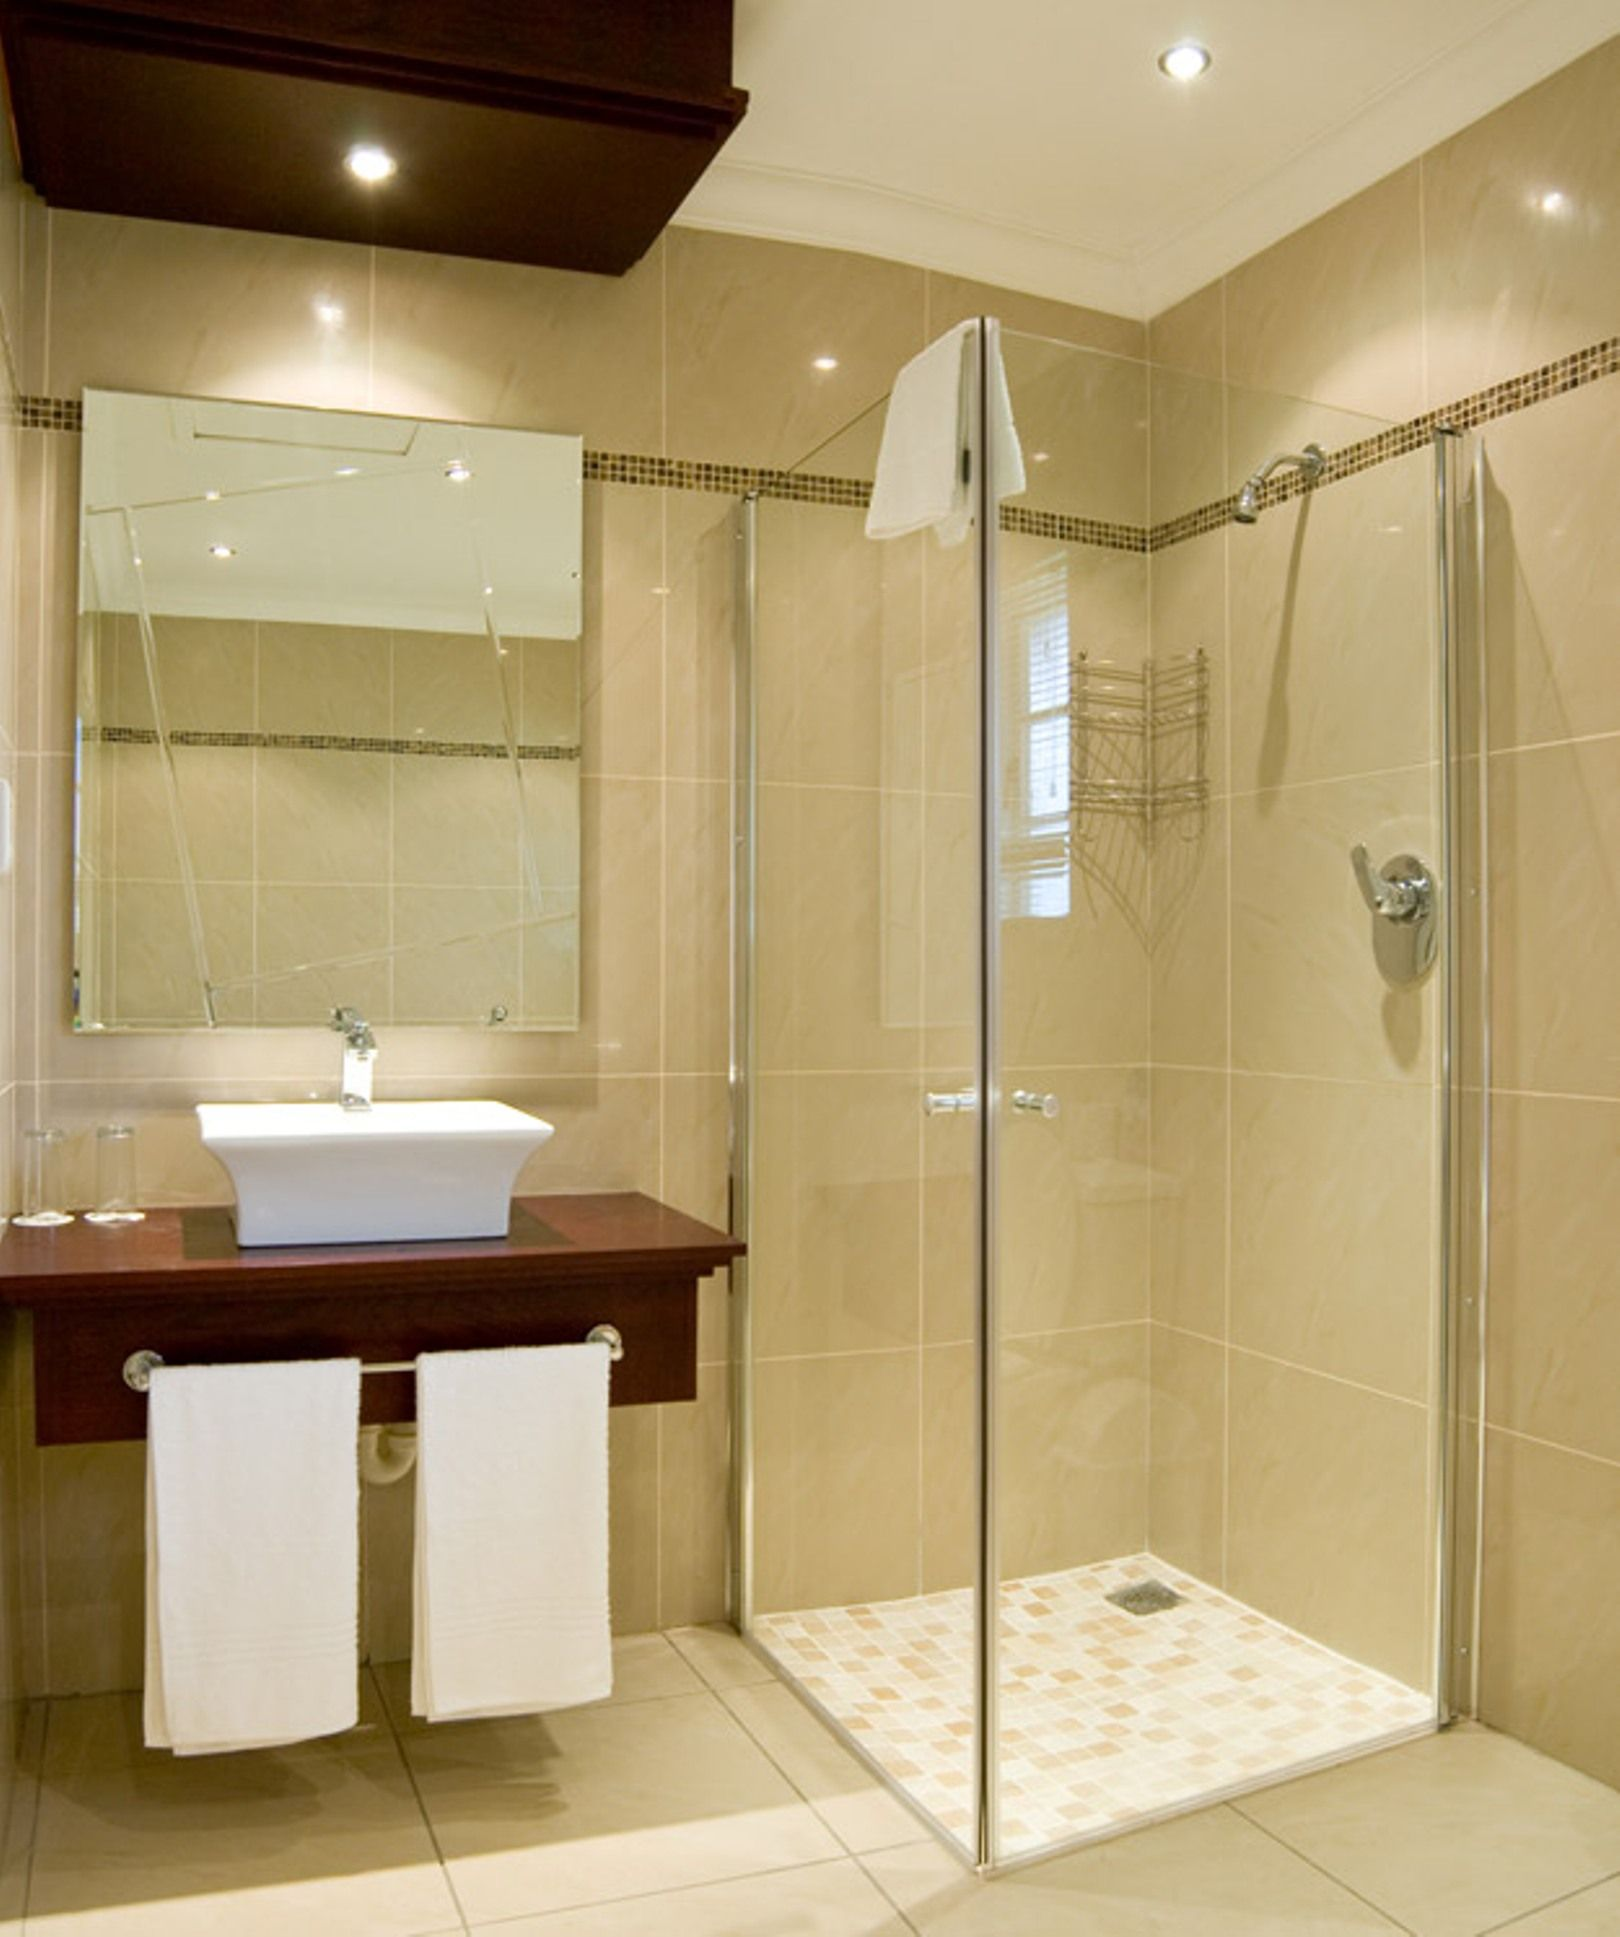 Fabulous Bathroom Design With Walk In Shower Bathroom Layout Bathroom Design Small Modern Basement Bathroom Remodeling